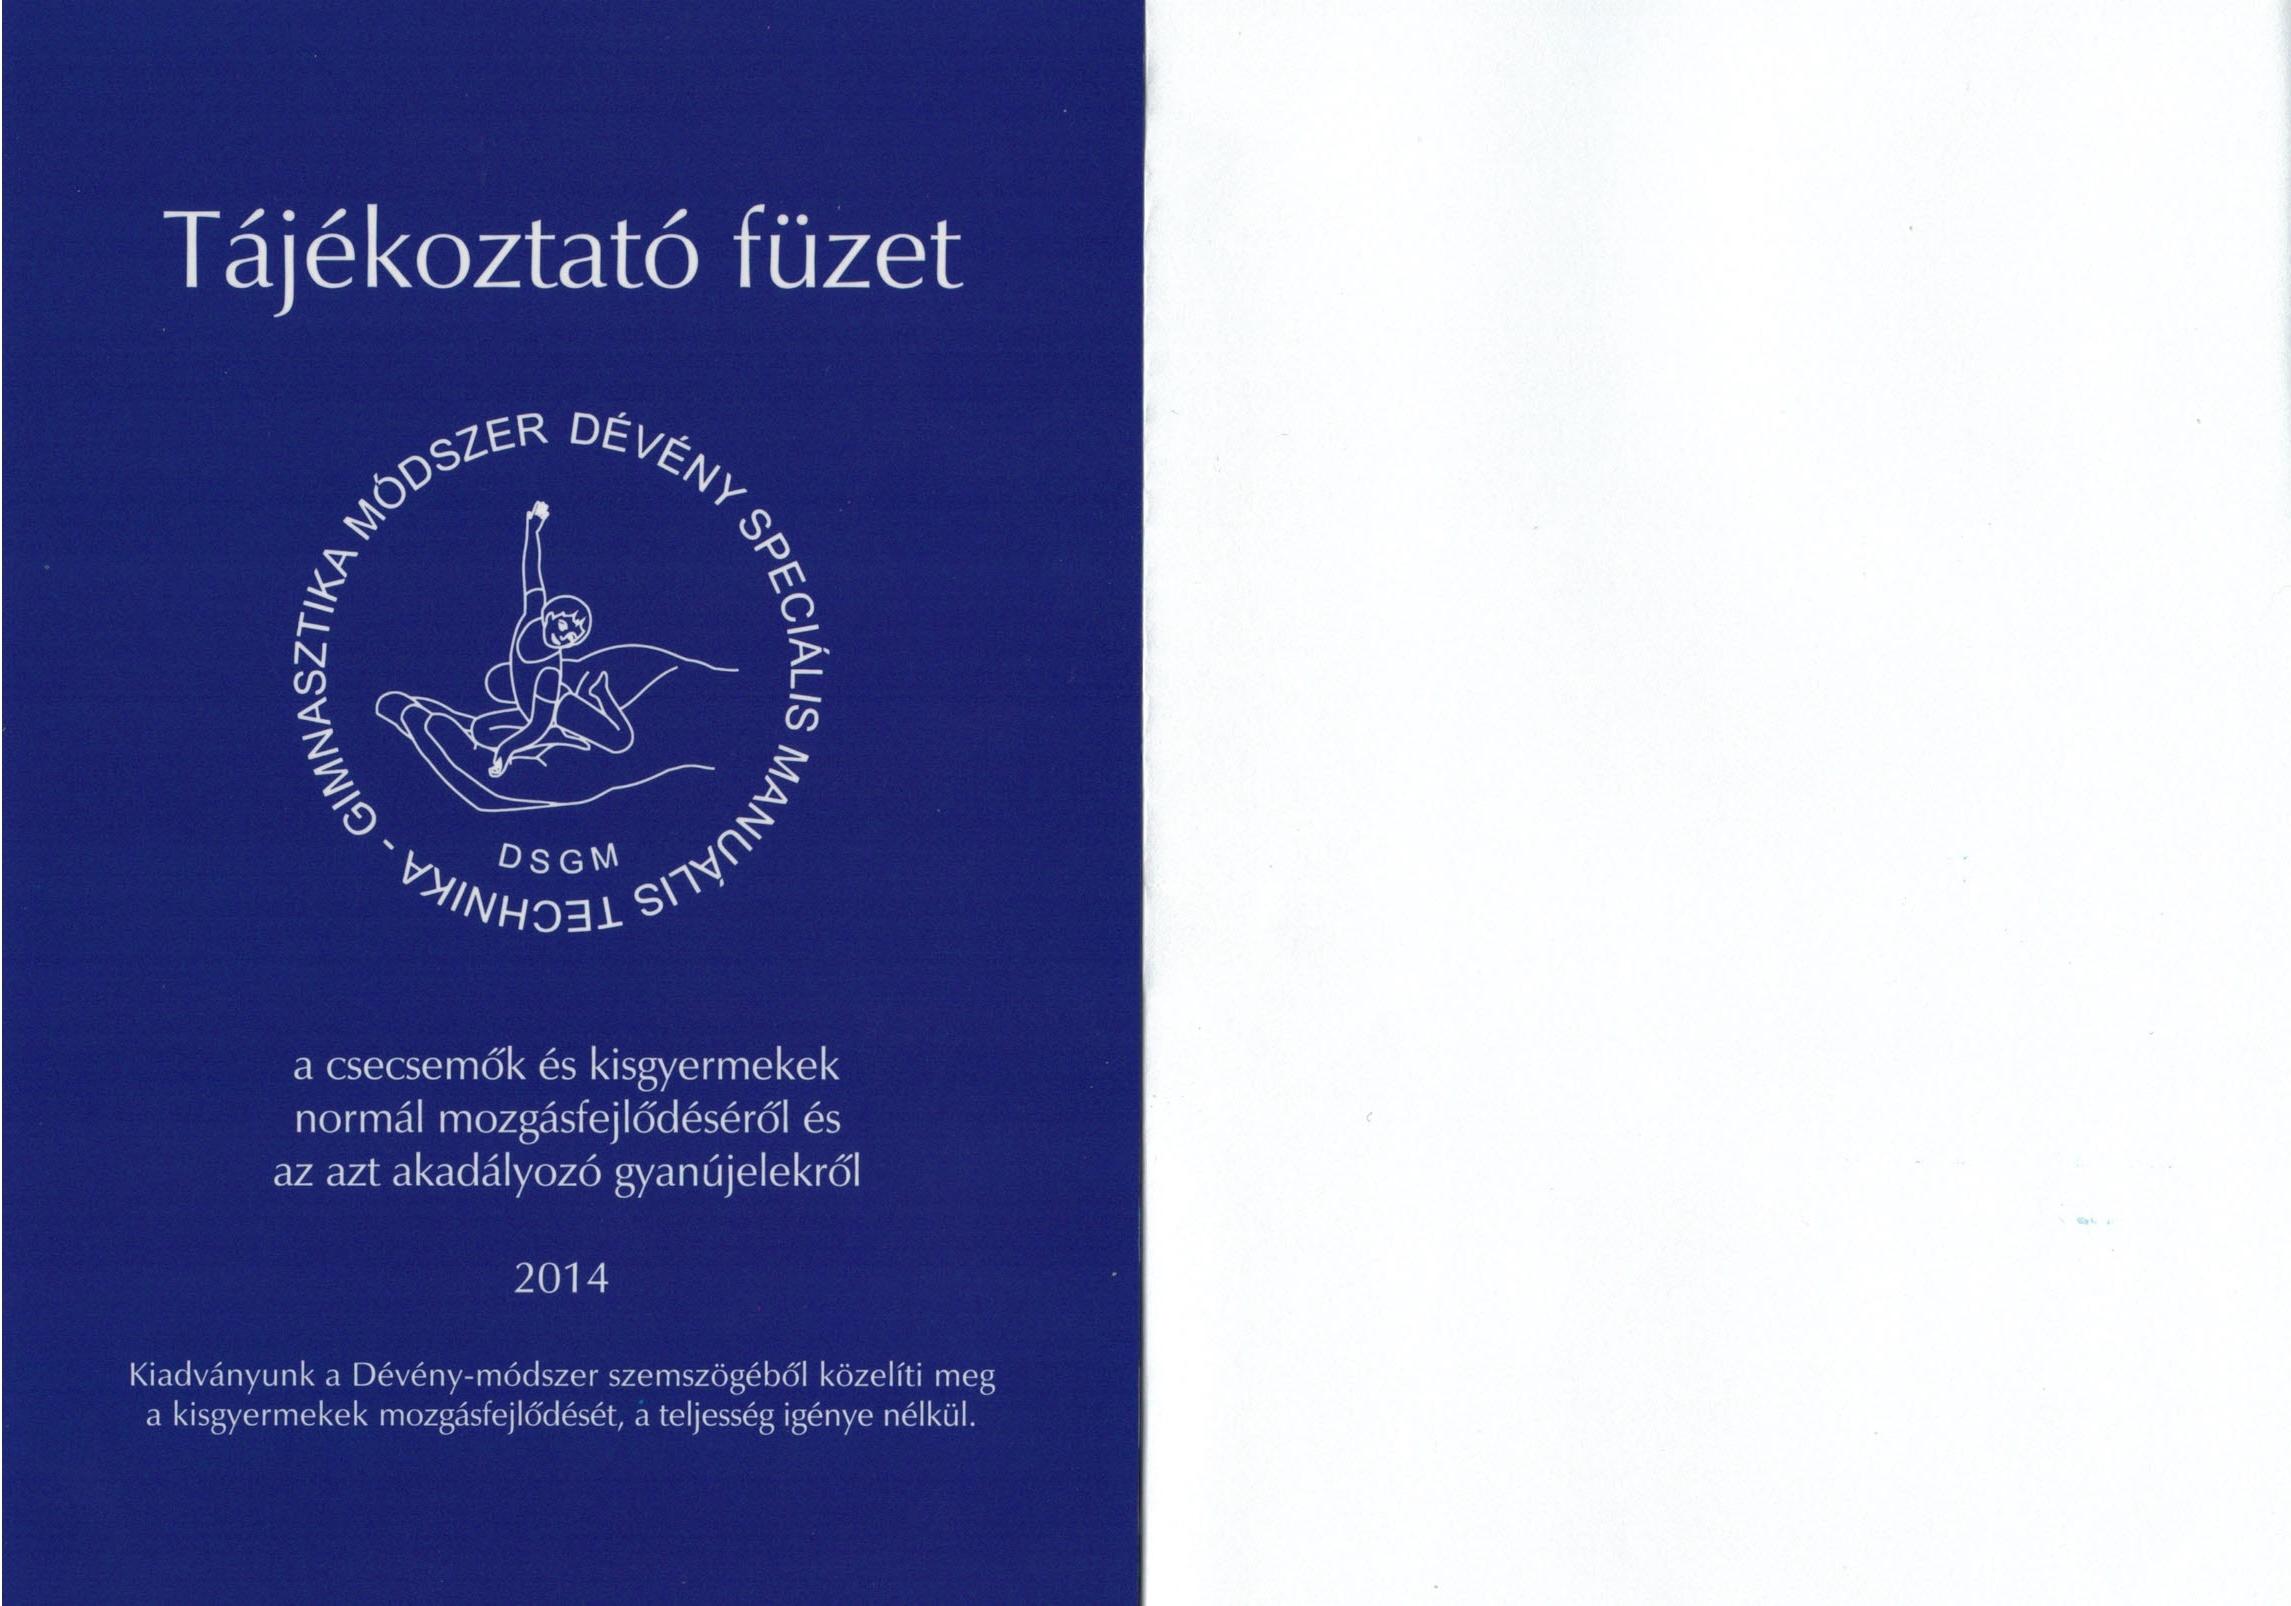 content/taj_fuzet/taj_fuzet_0.jpg